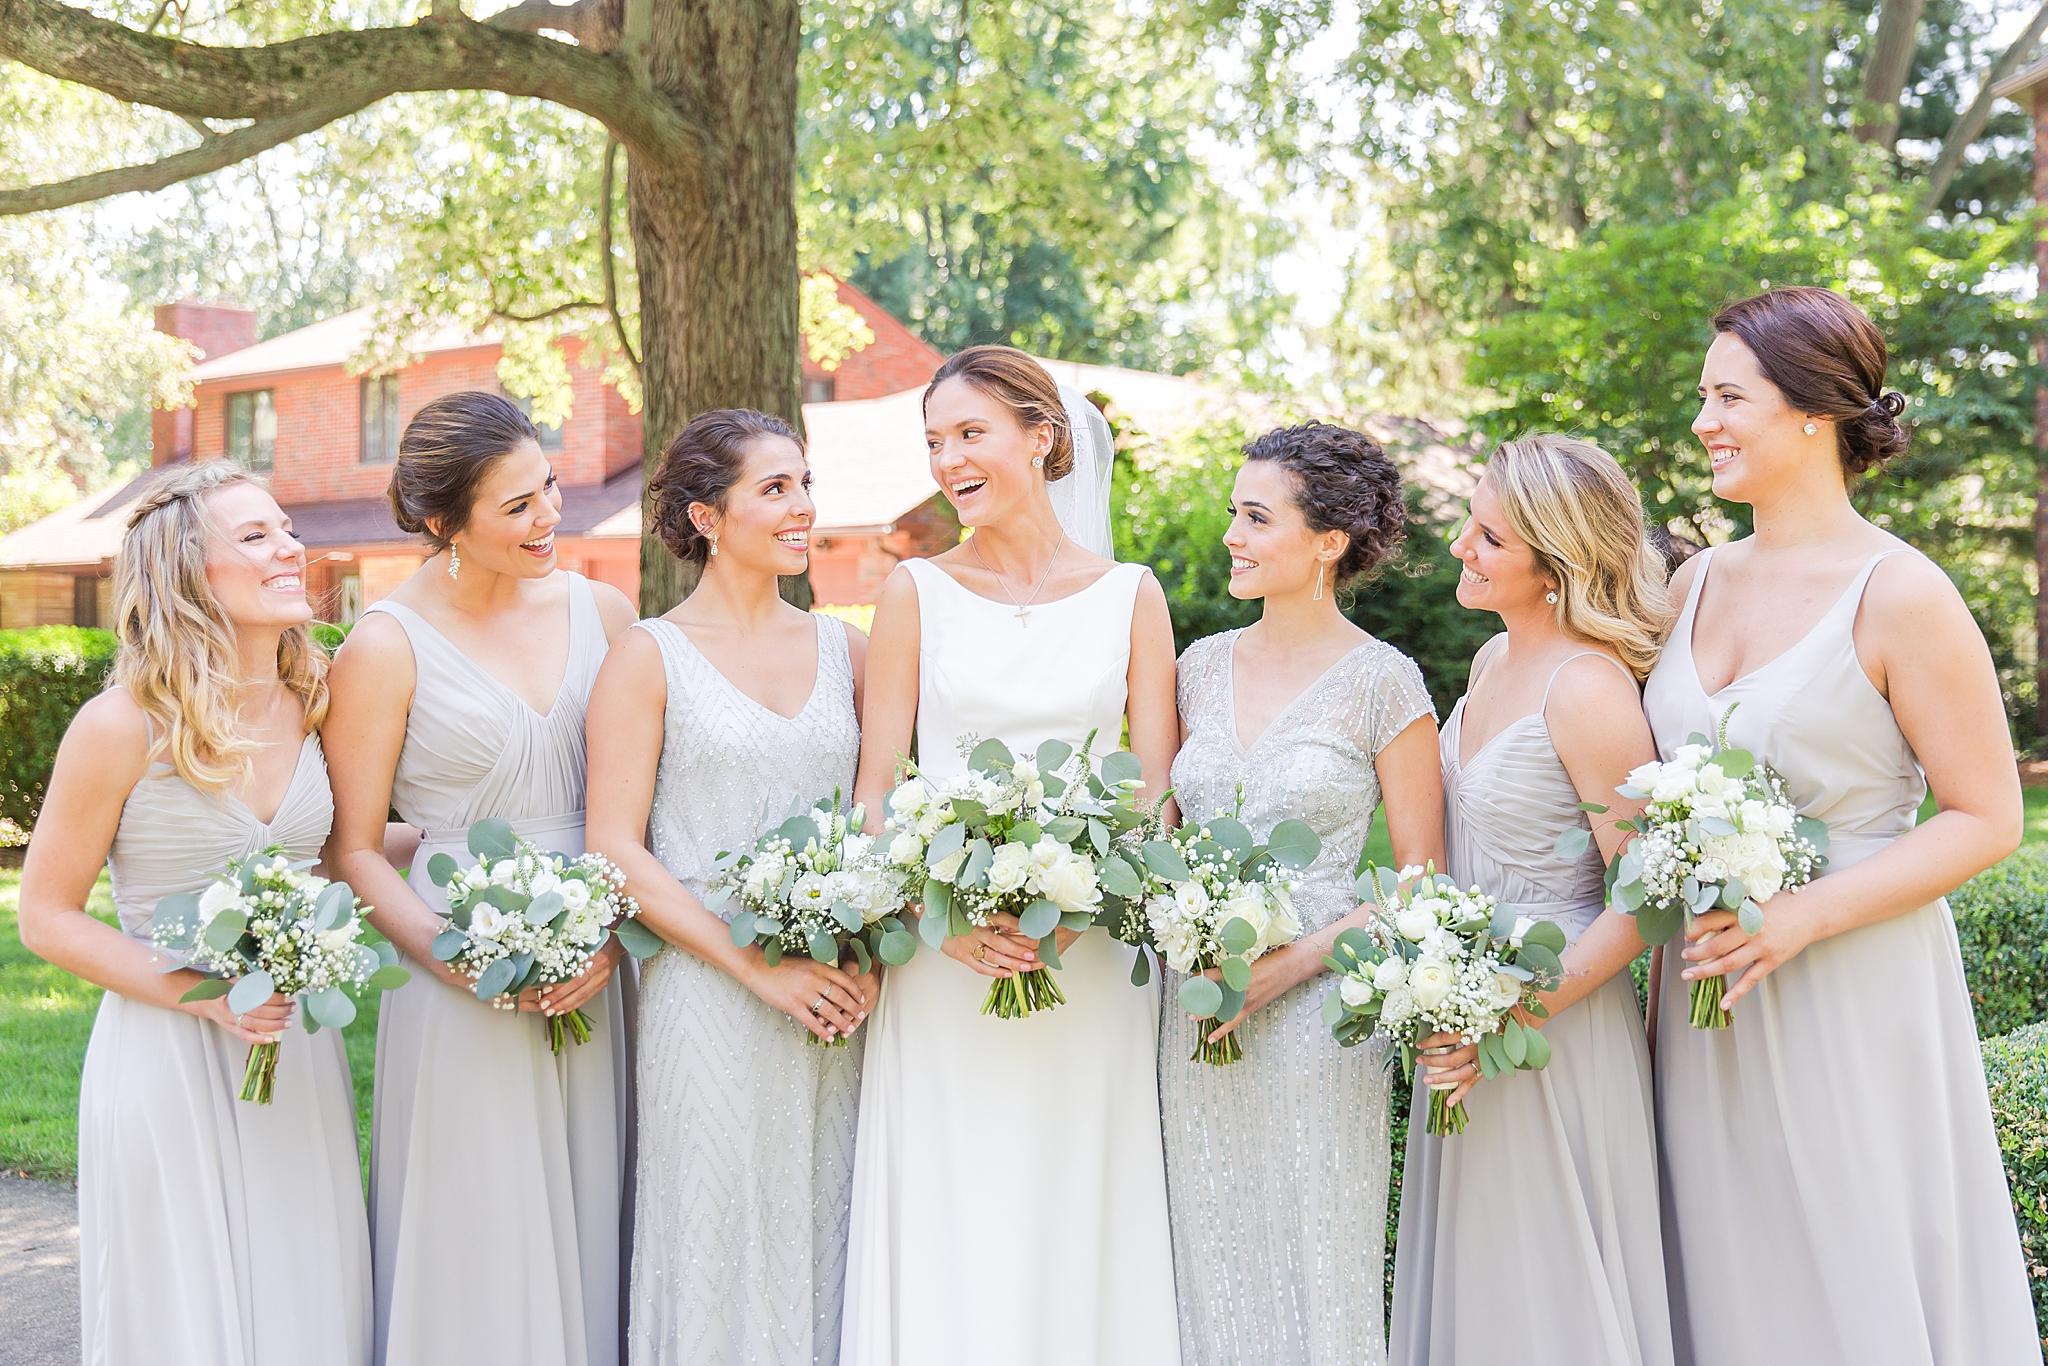 detroit-wedding-photographer-grosse-pointe-academy-chapel-detroit-golf-club-wedding-carly-matt-by-courtney-carolyn-photography_0018.jpg